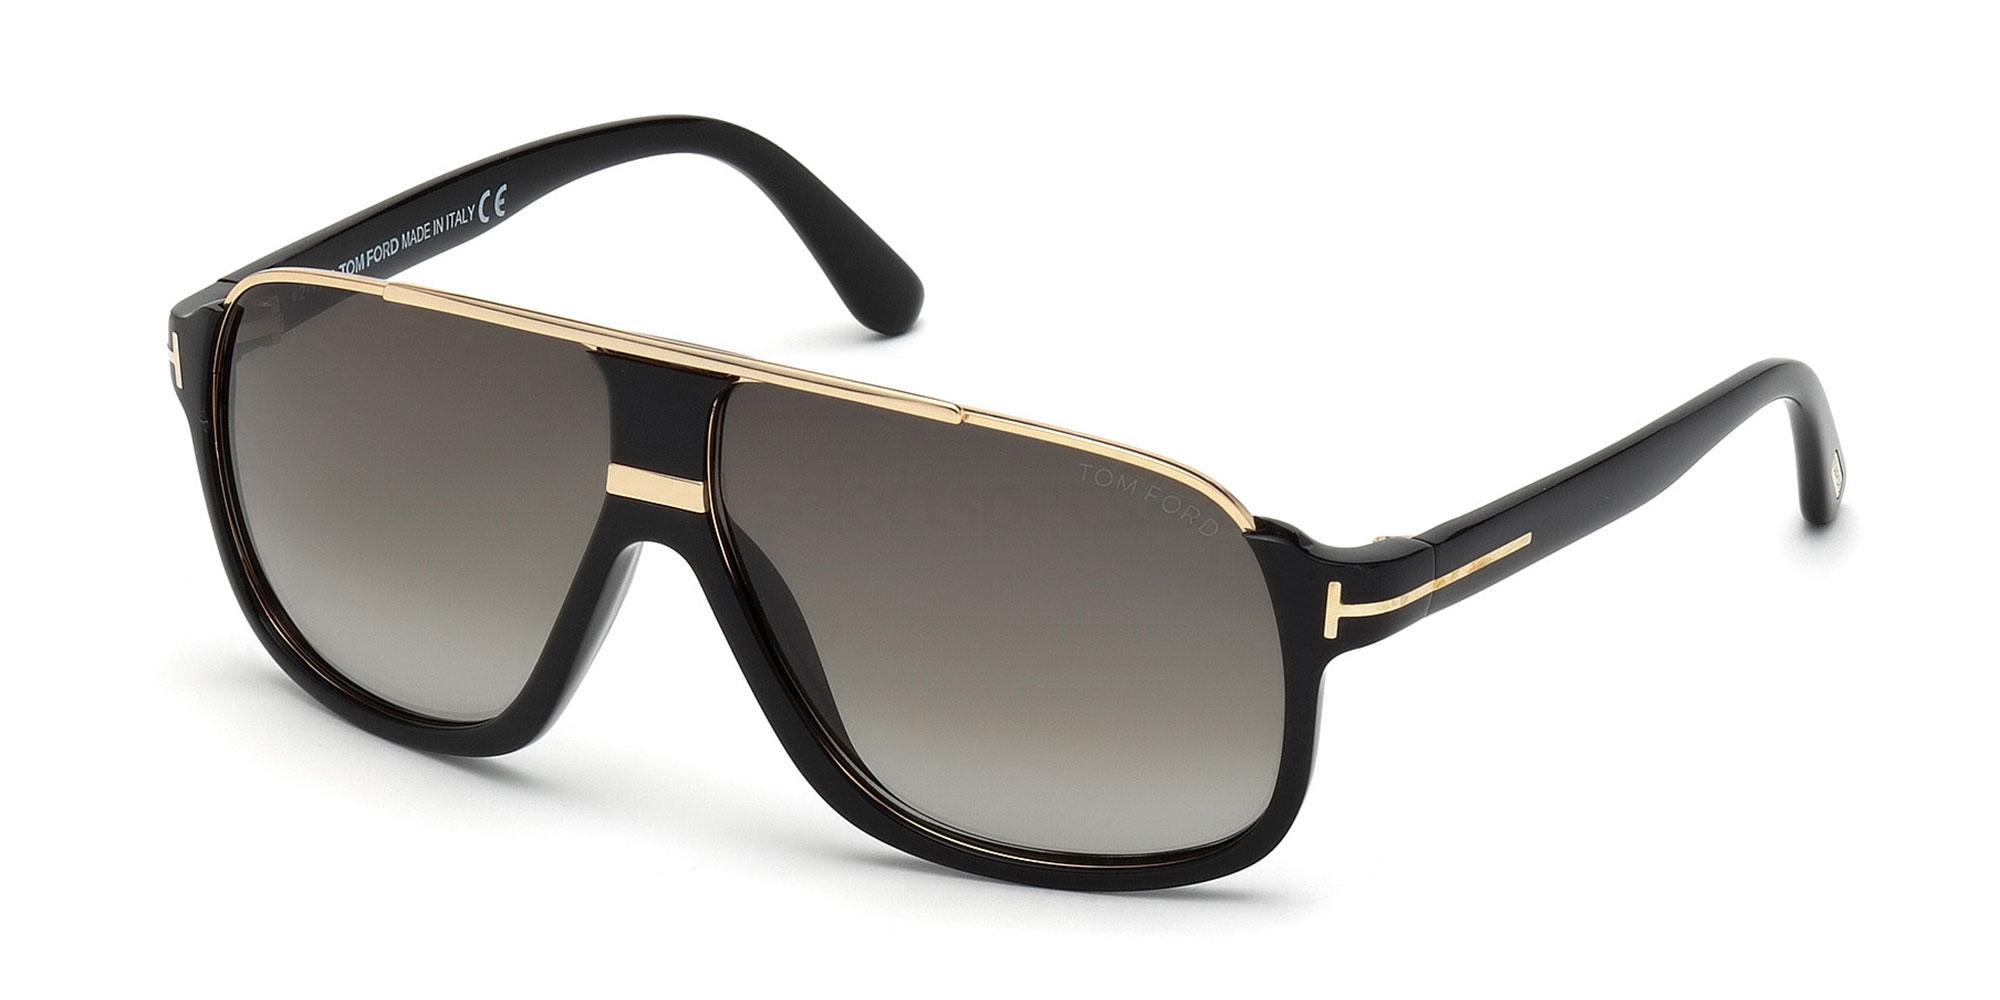 01P FT0335 Sunglasses, Tom Ford